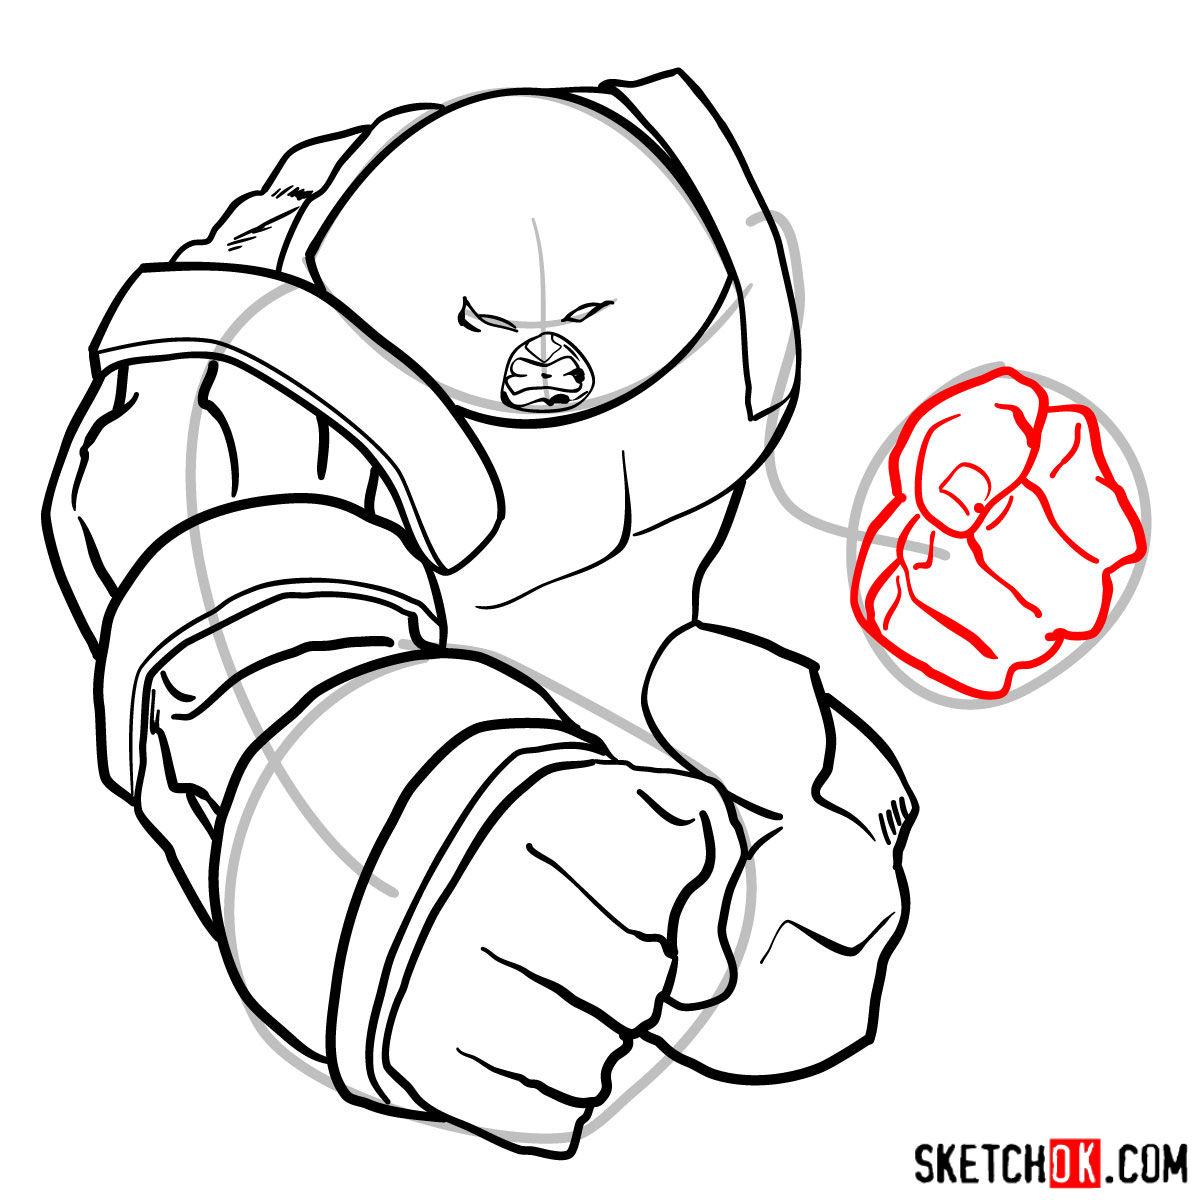 How to draw Juggernaut, the villian from X-Men series - step 11